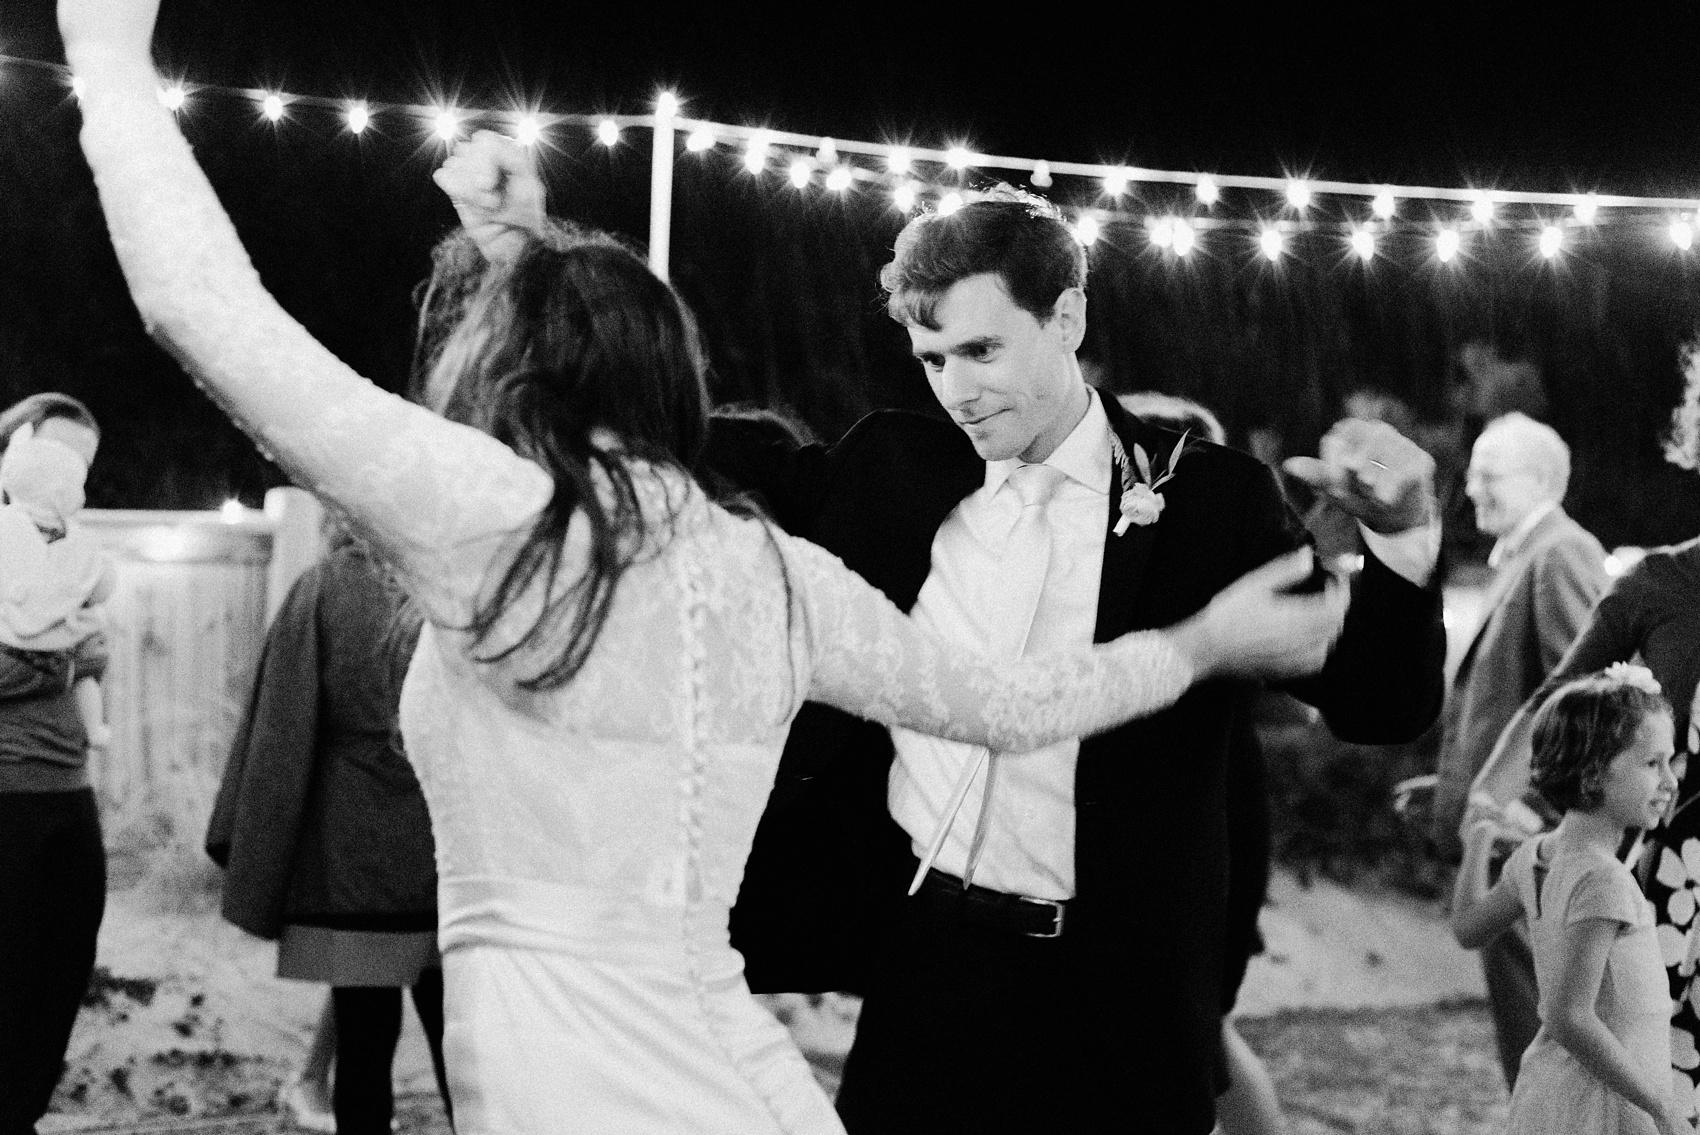 outerbanks_wedding_photographer_1337.jpg